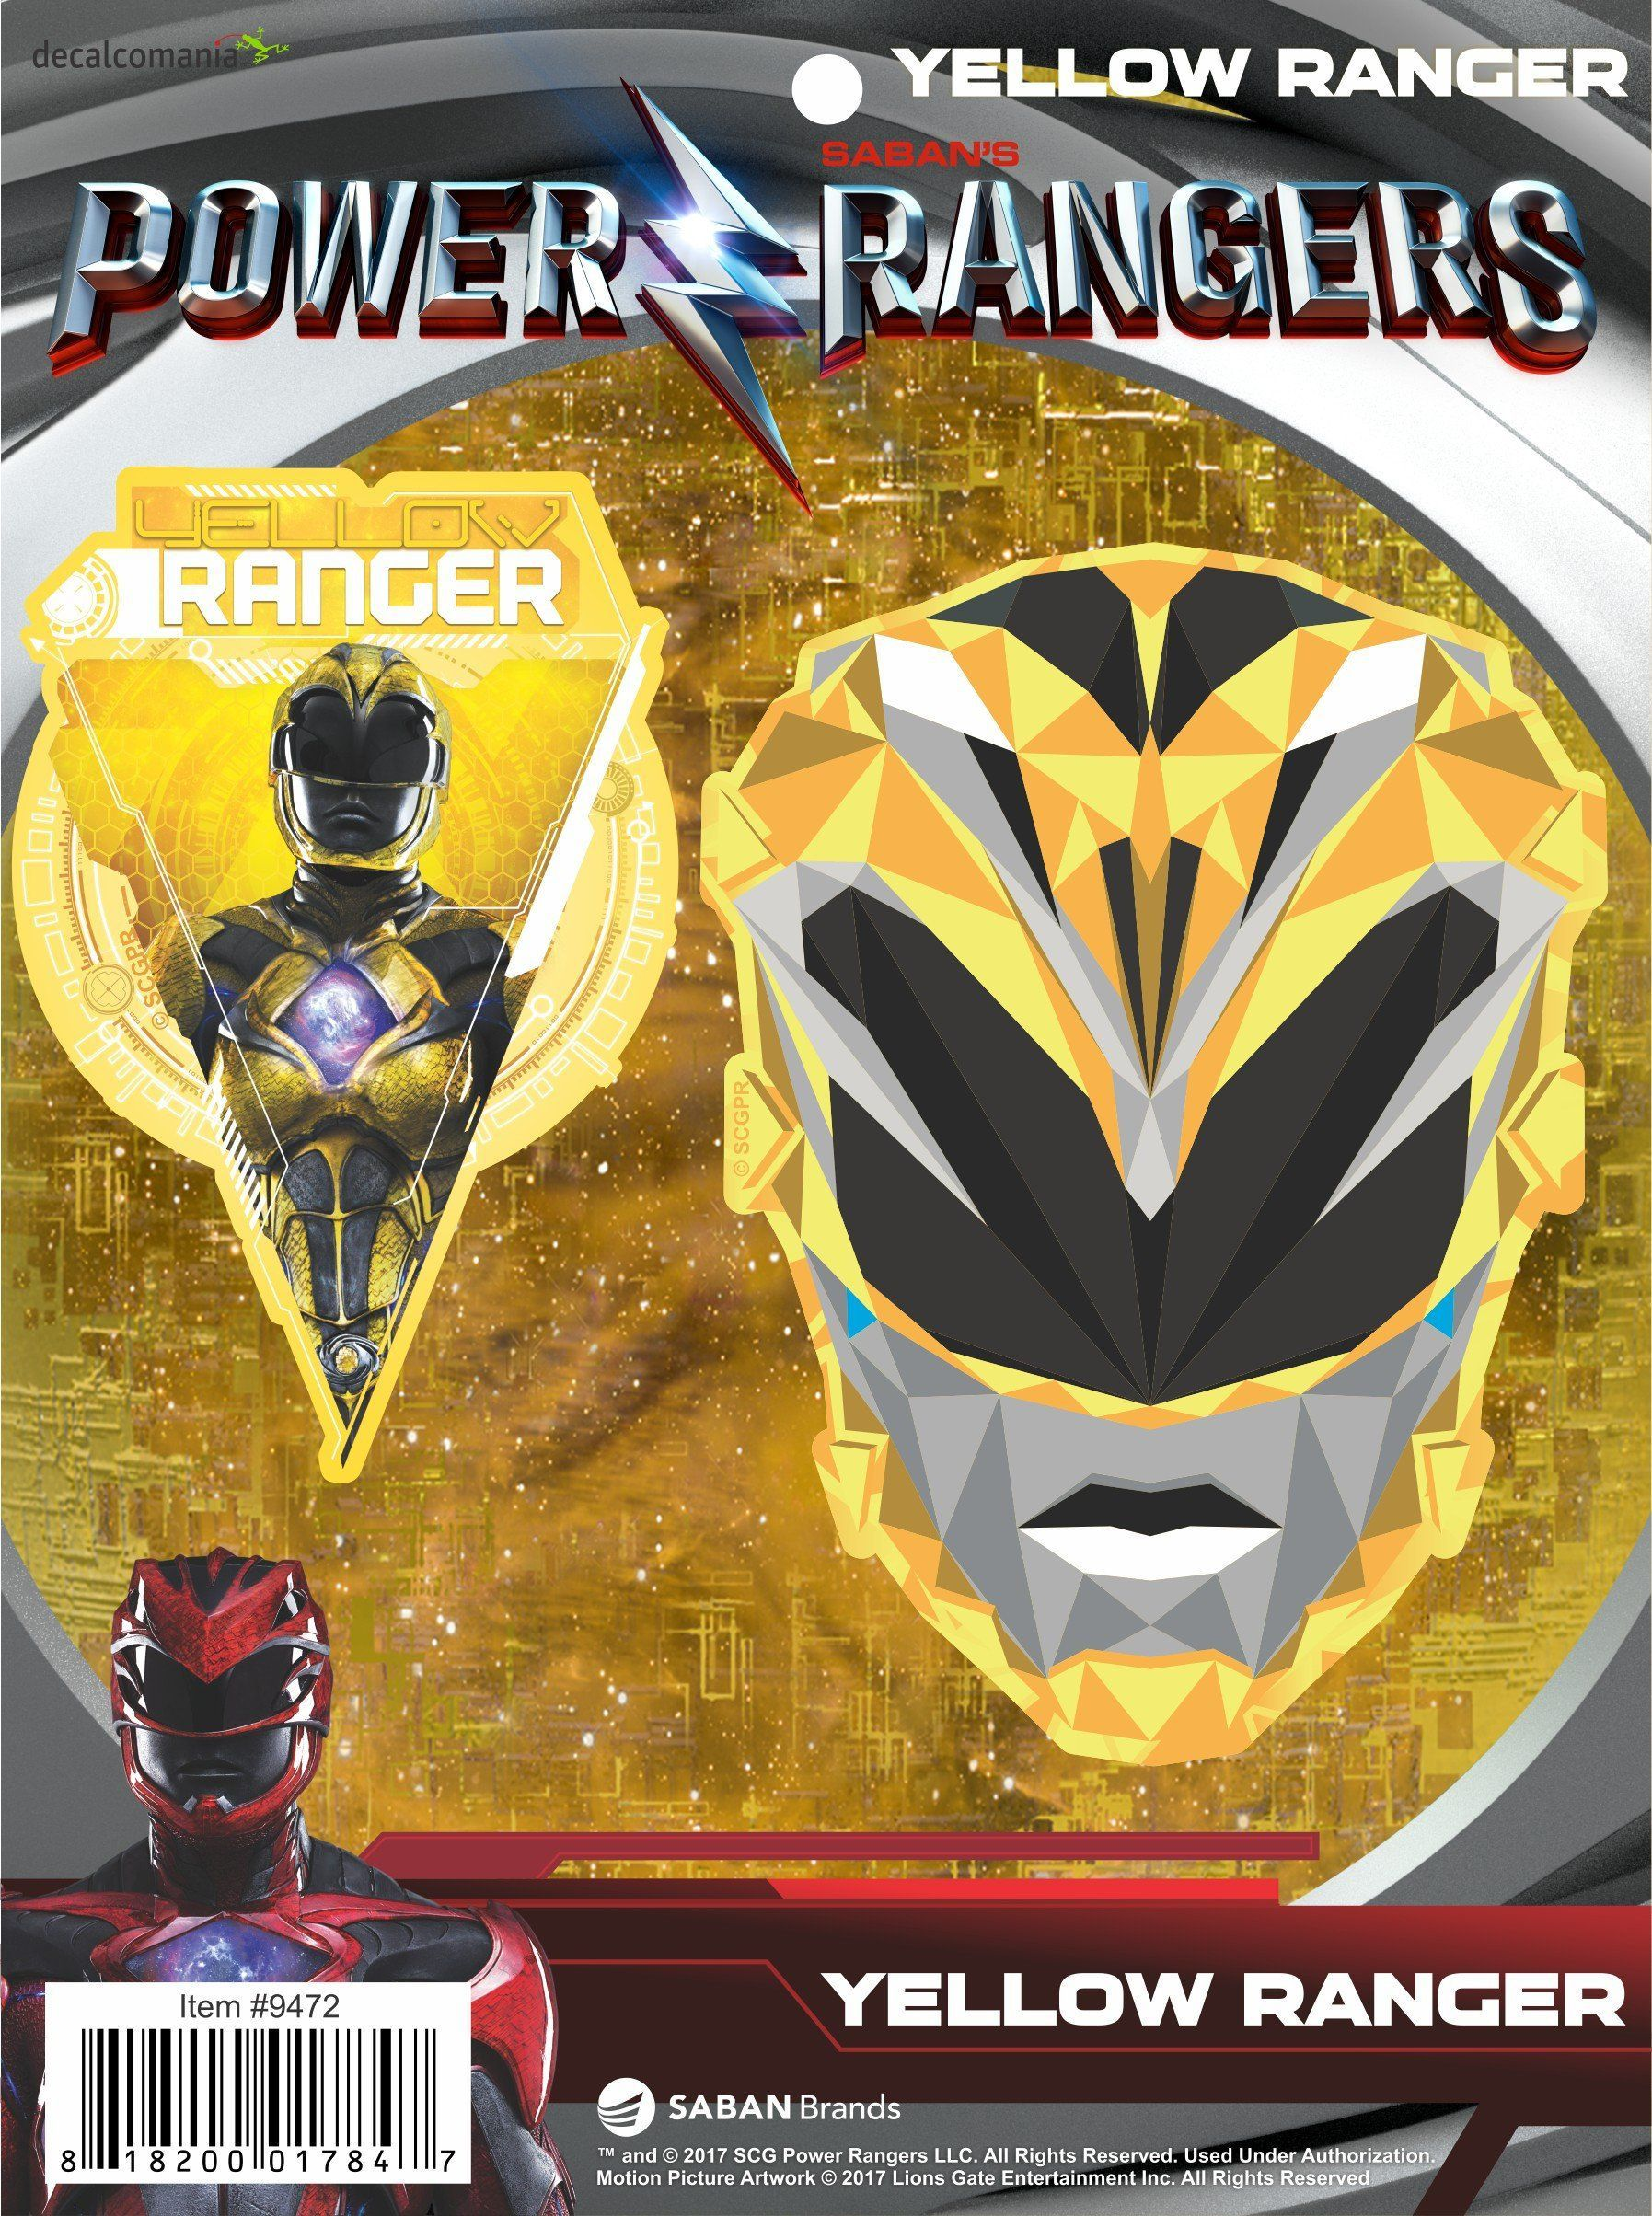 Power Rangers Movie Yellow Ranger Decal Car Sticker | Pinterest ...